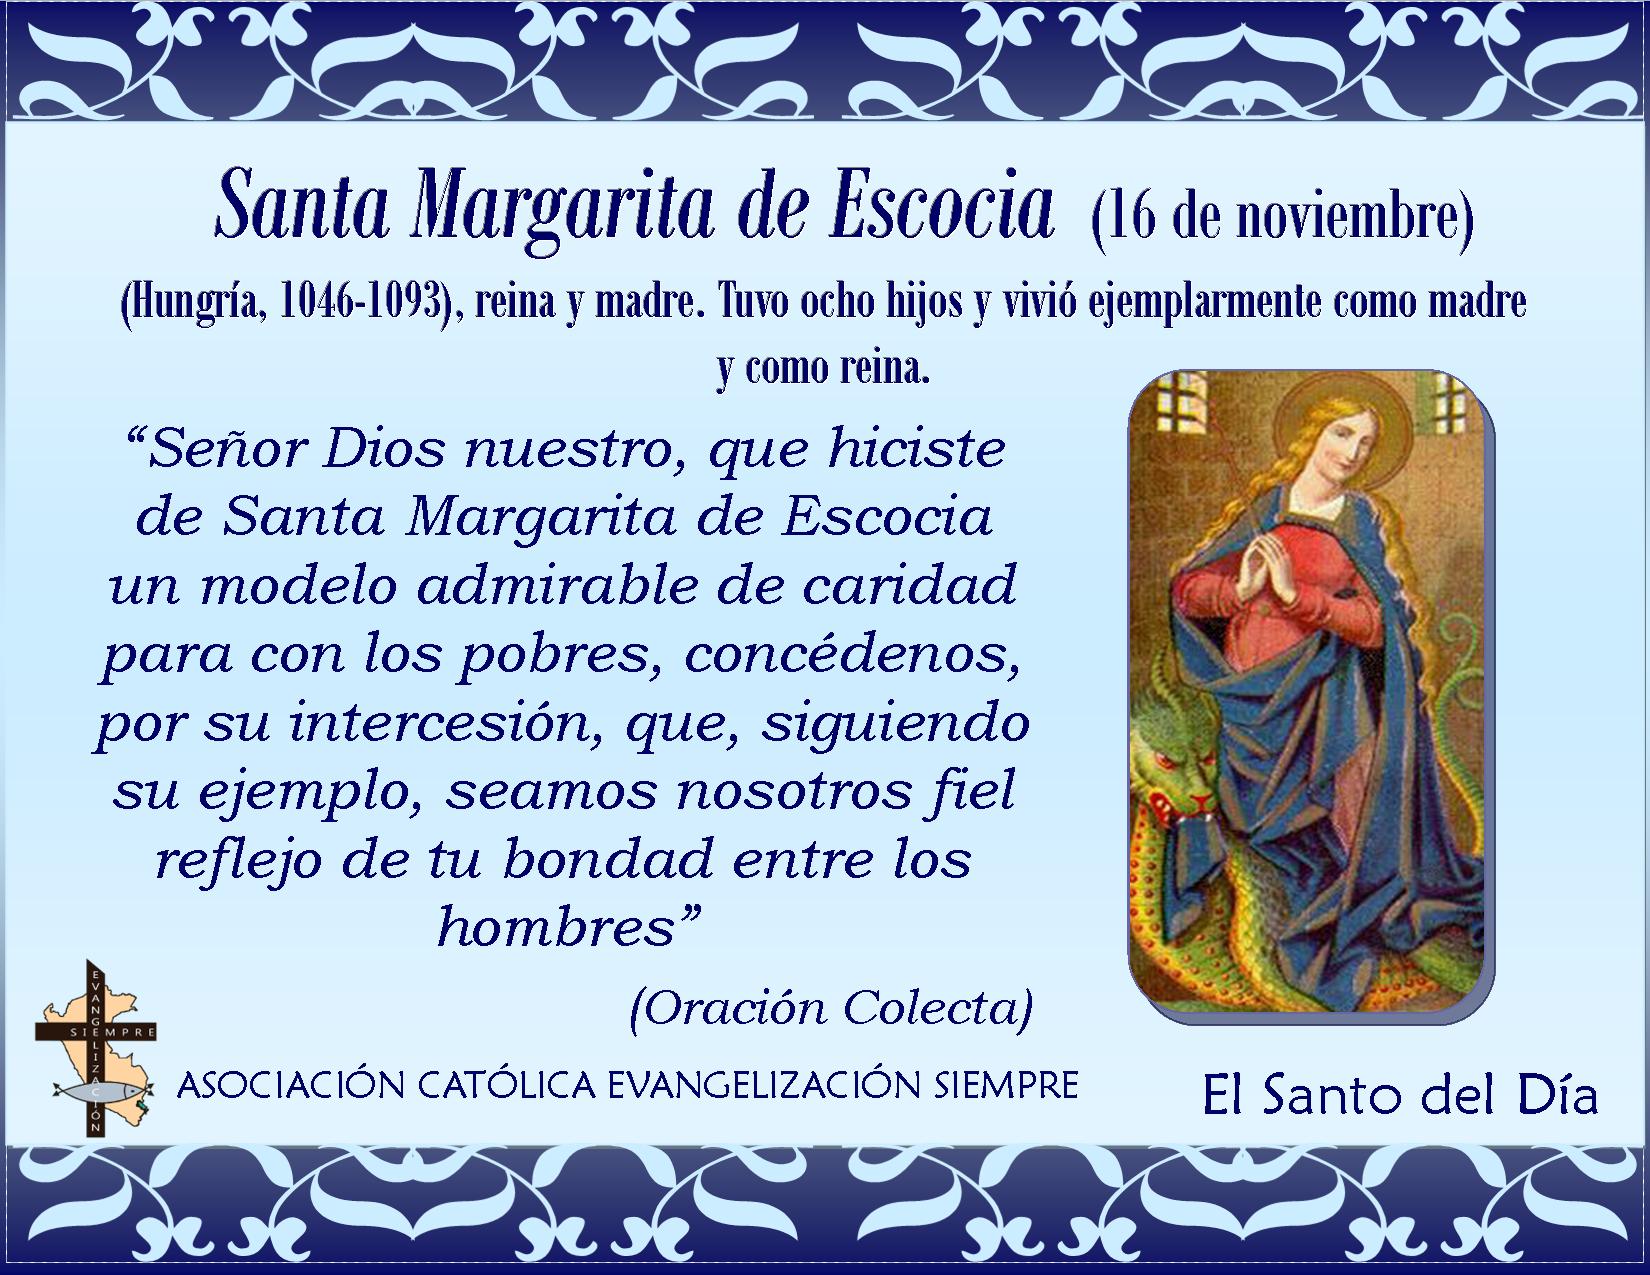 santo-del-dia-16-noviembre